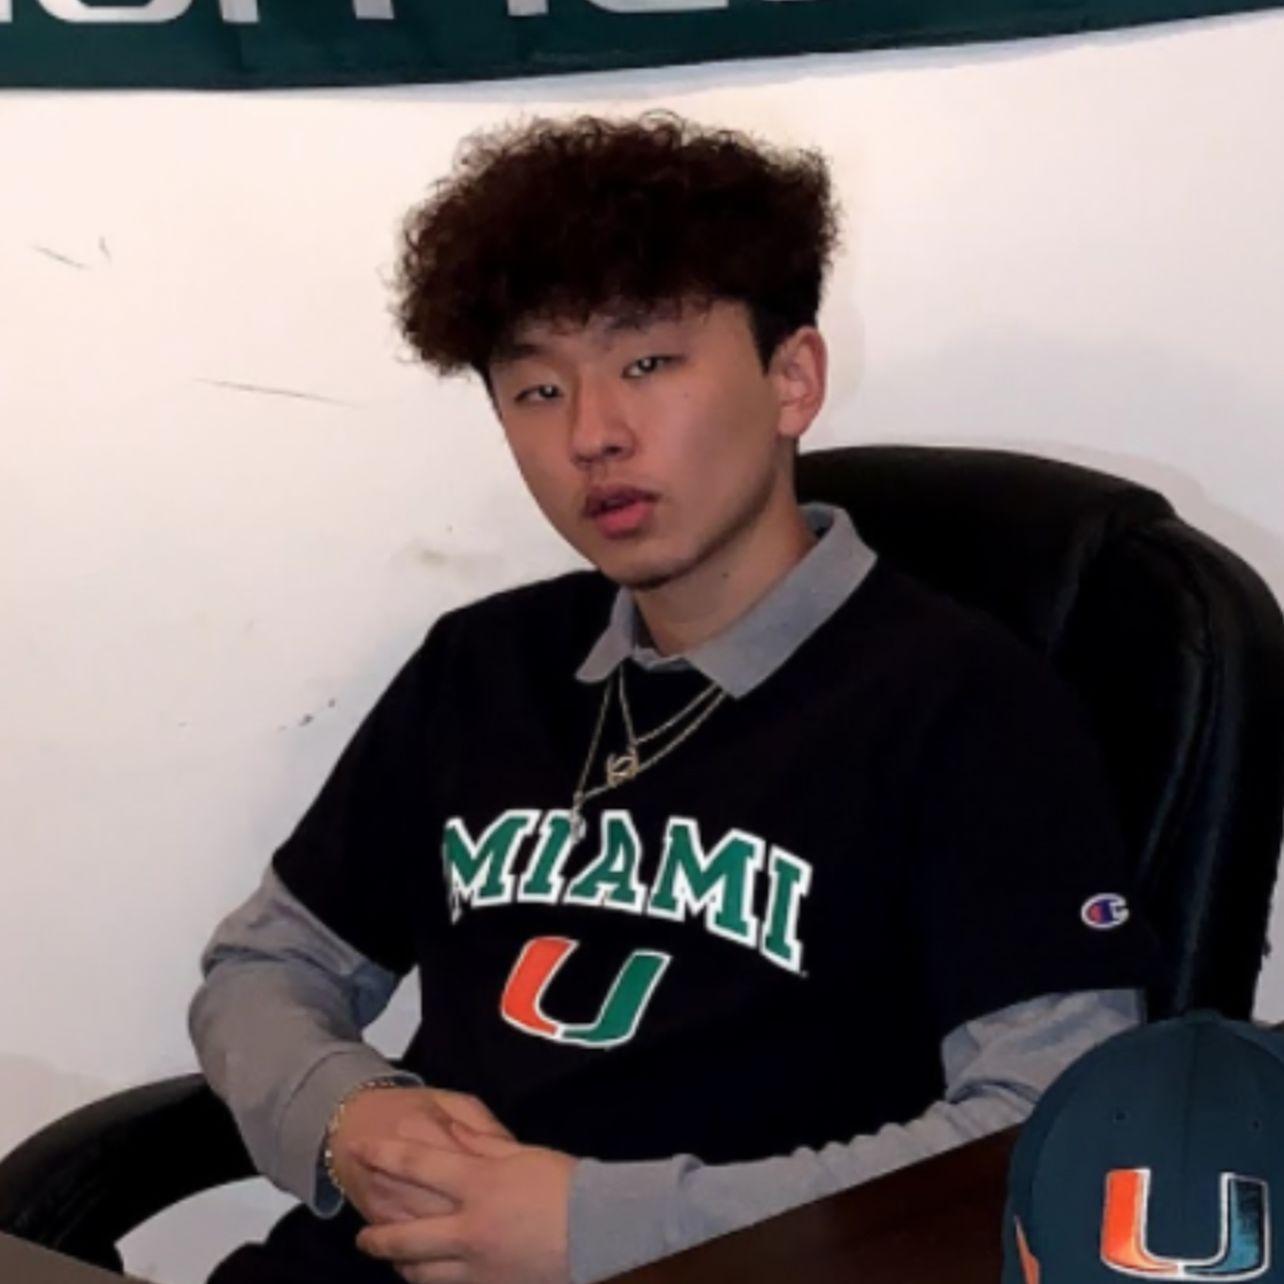 Brandon Lee from University of Miami